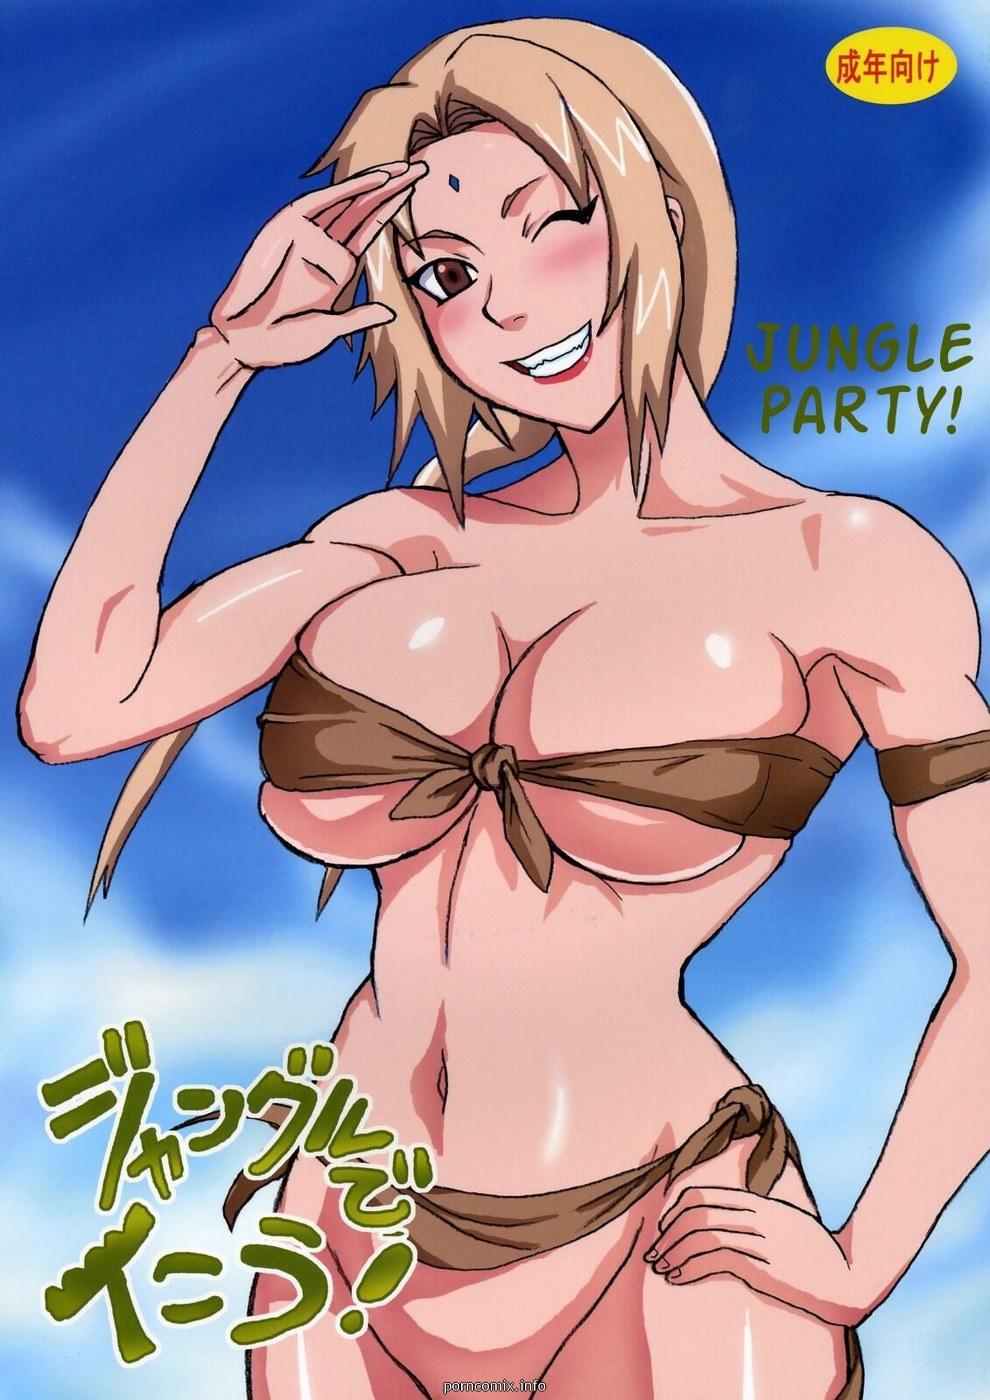 Naruto- Jungle Party image 1